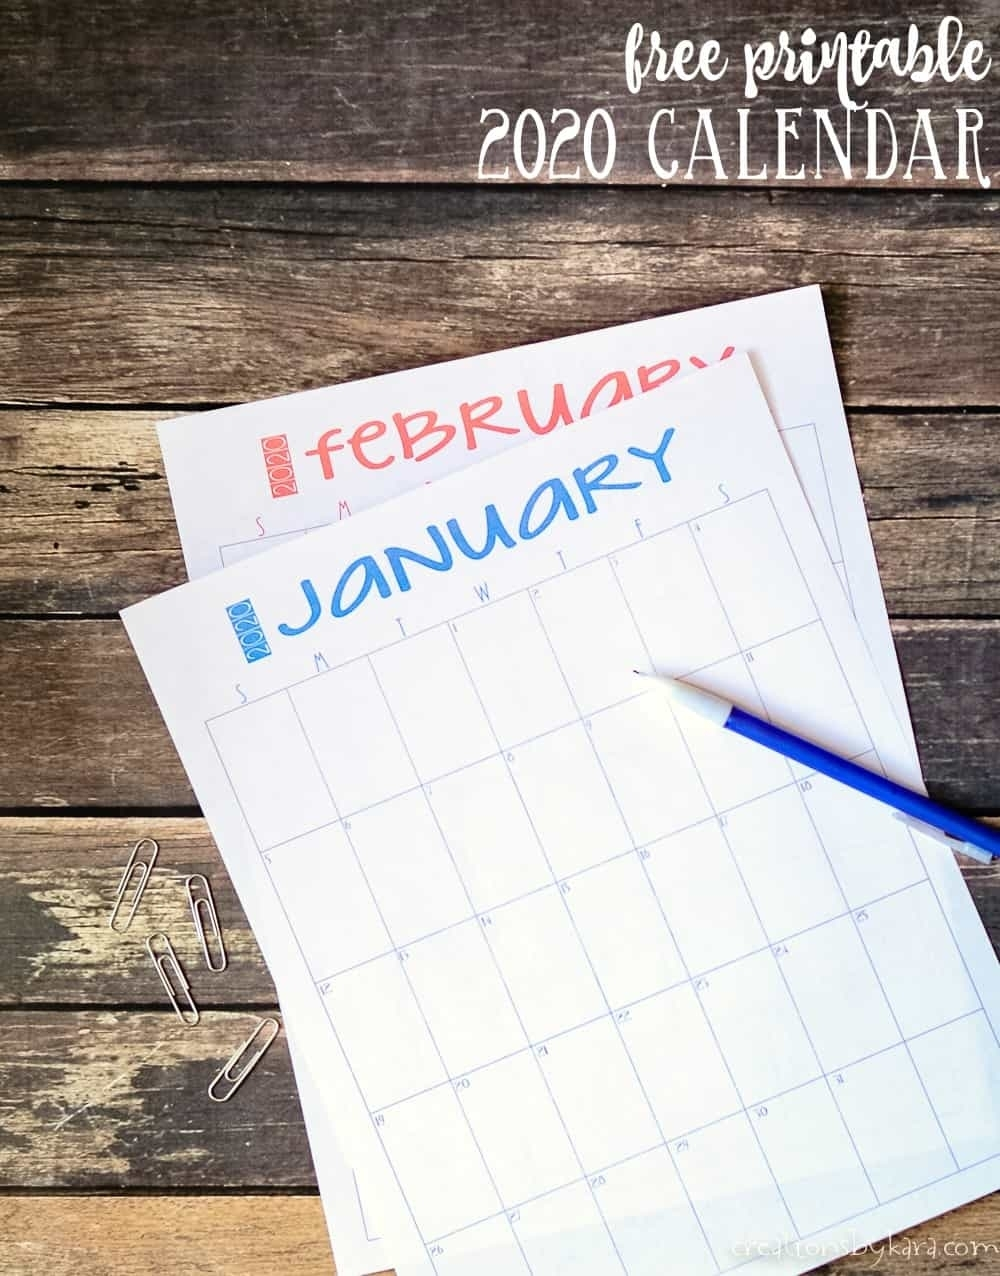 2020 Free Printable Calendar - Creationskara